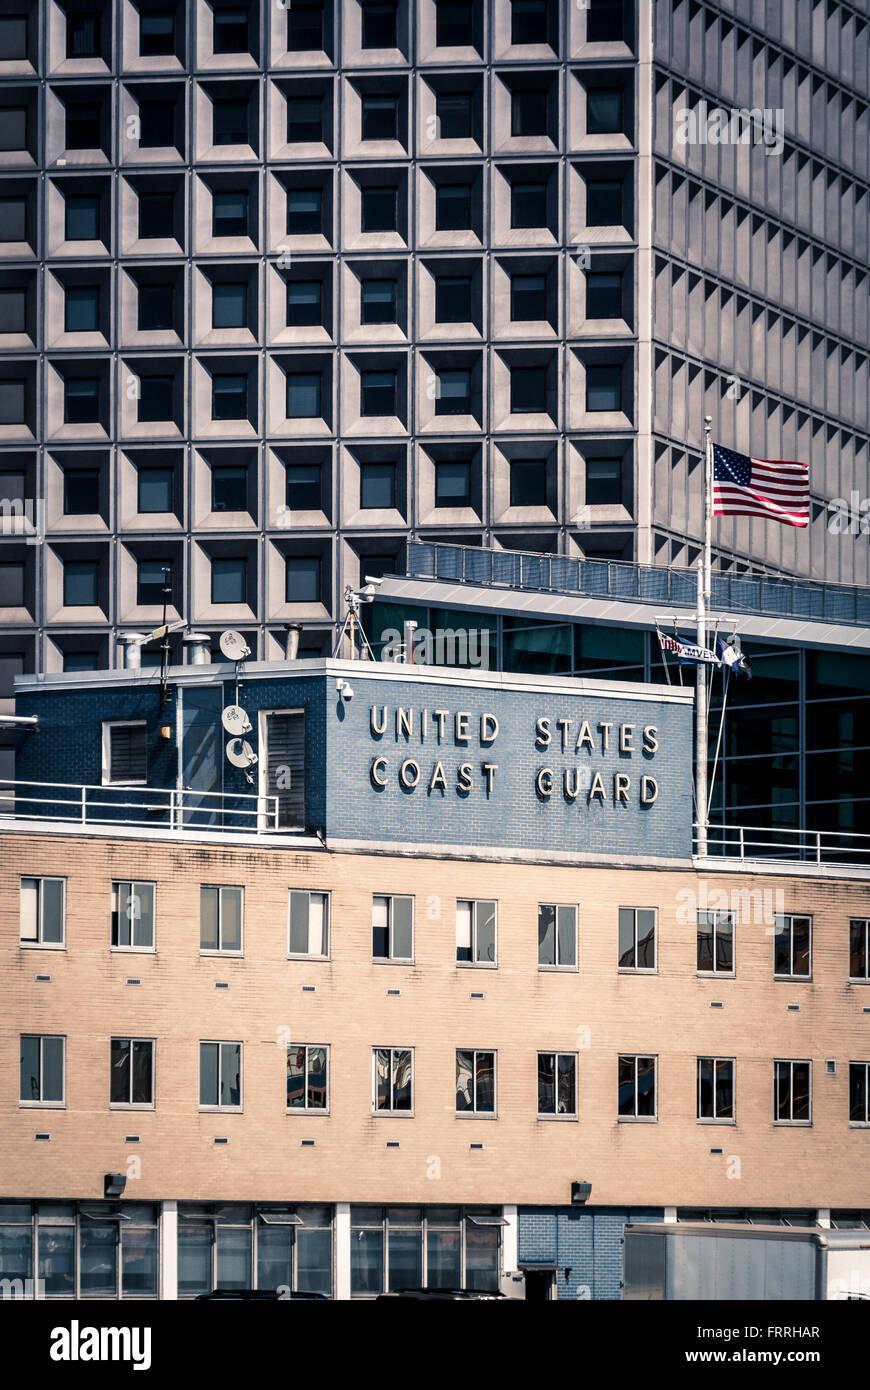 United States Coast Guard Building, New York City, USA. - Stock Image